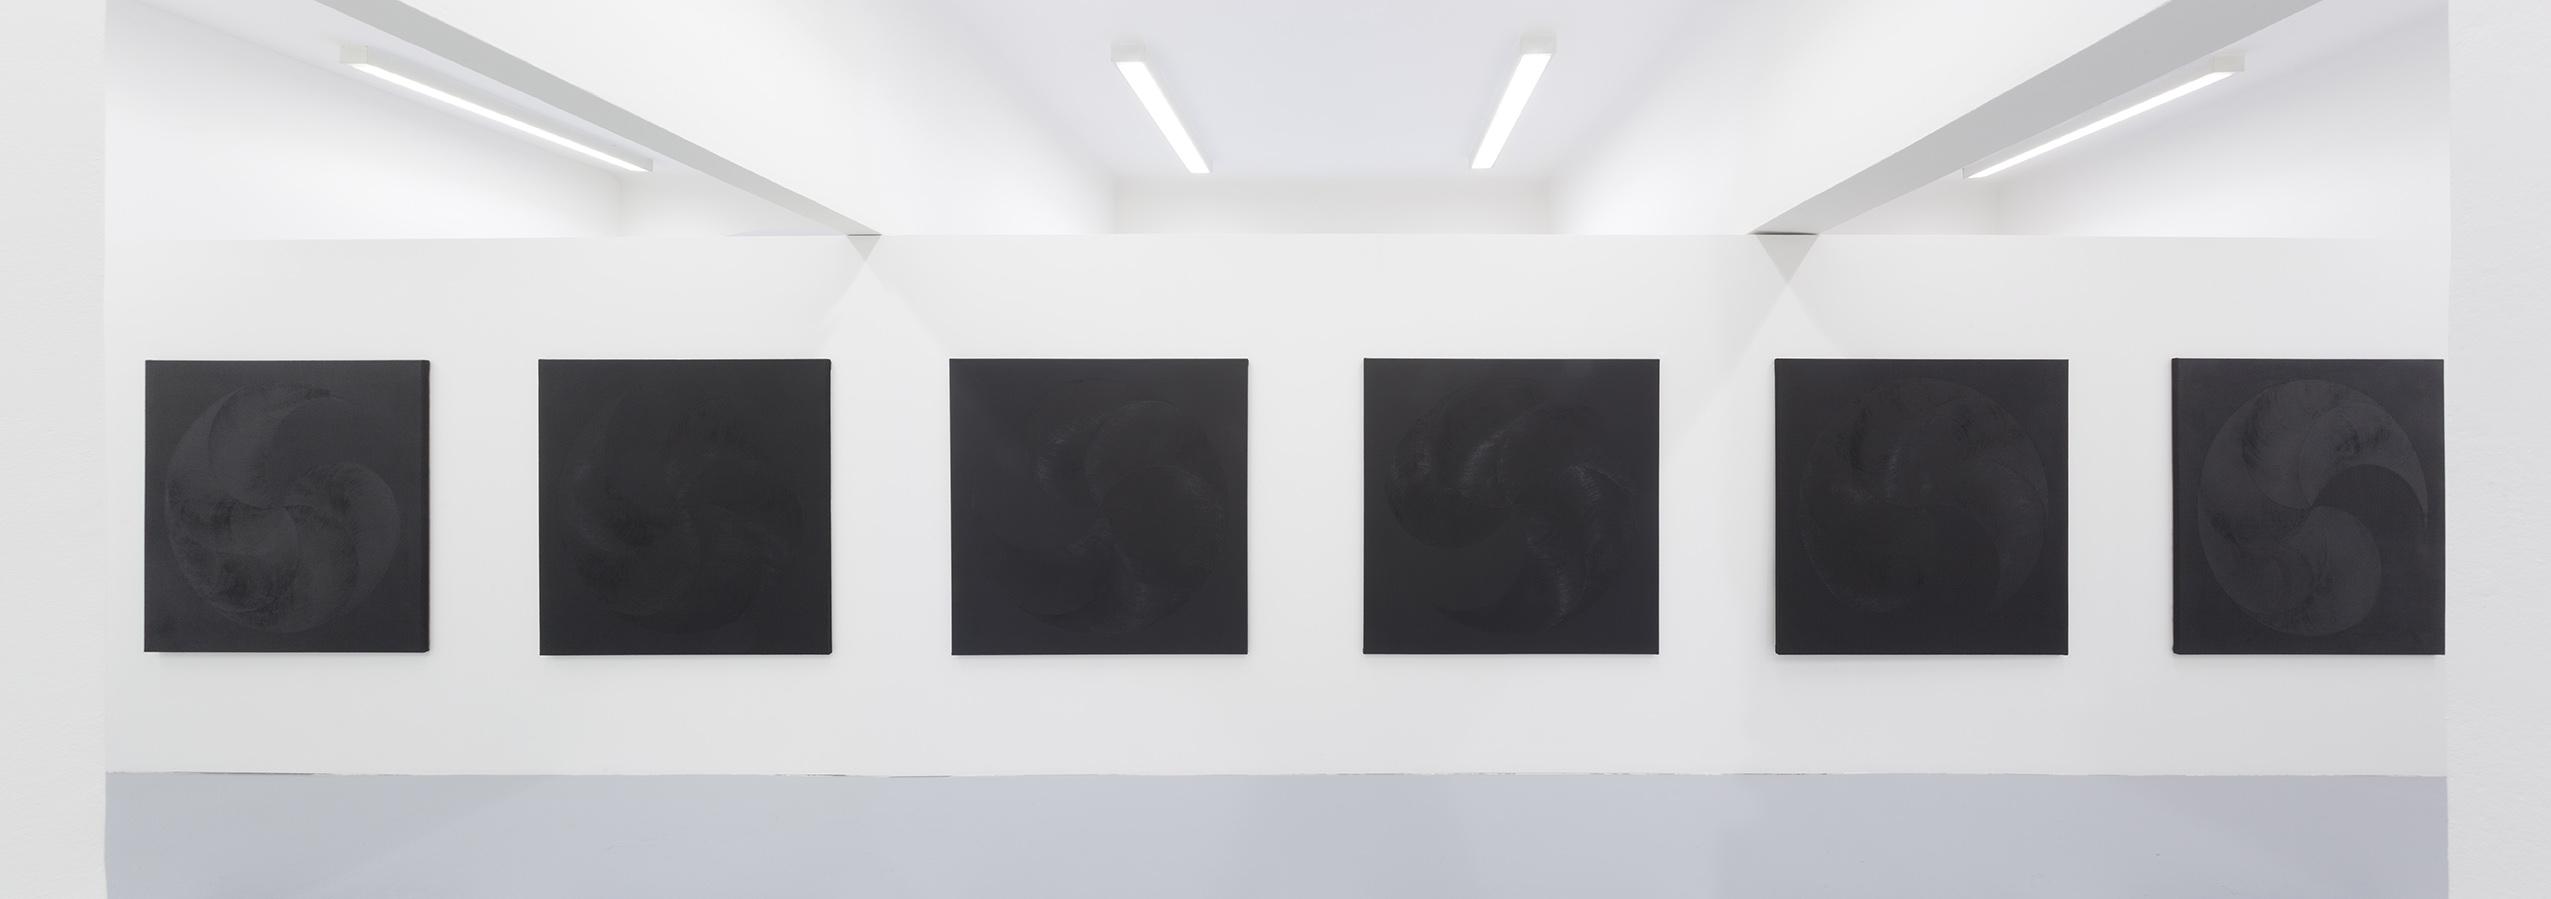 6x oil on canvas, 130 x 130